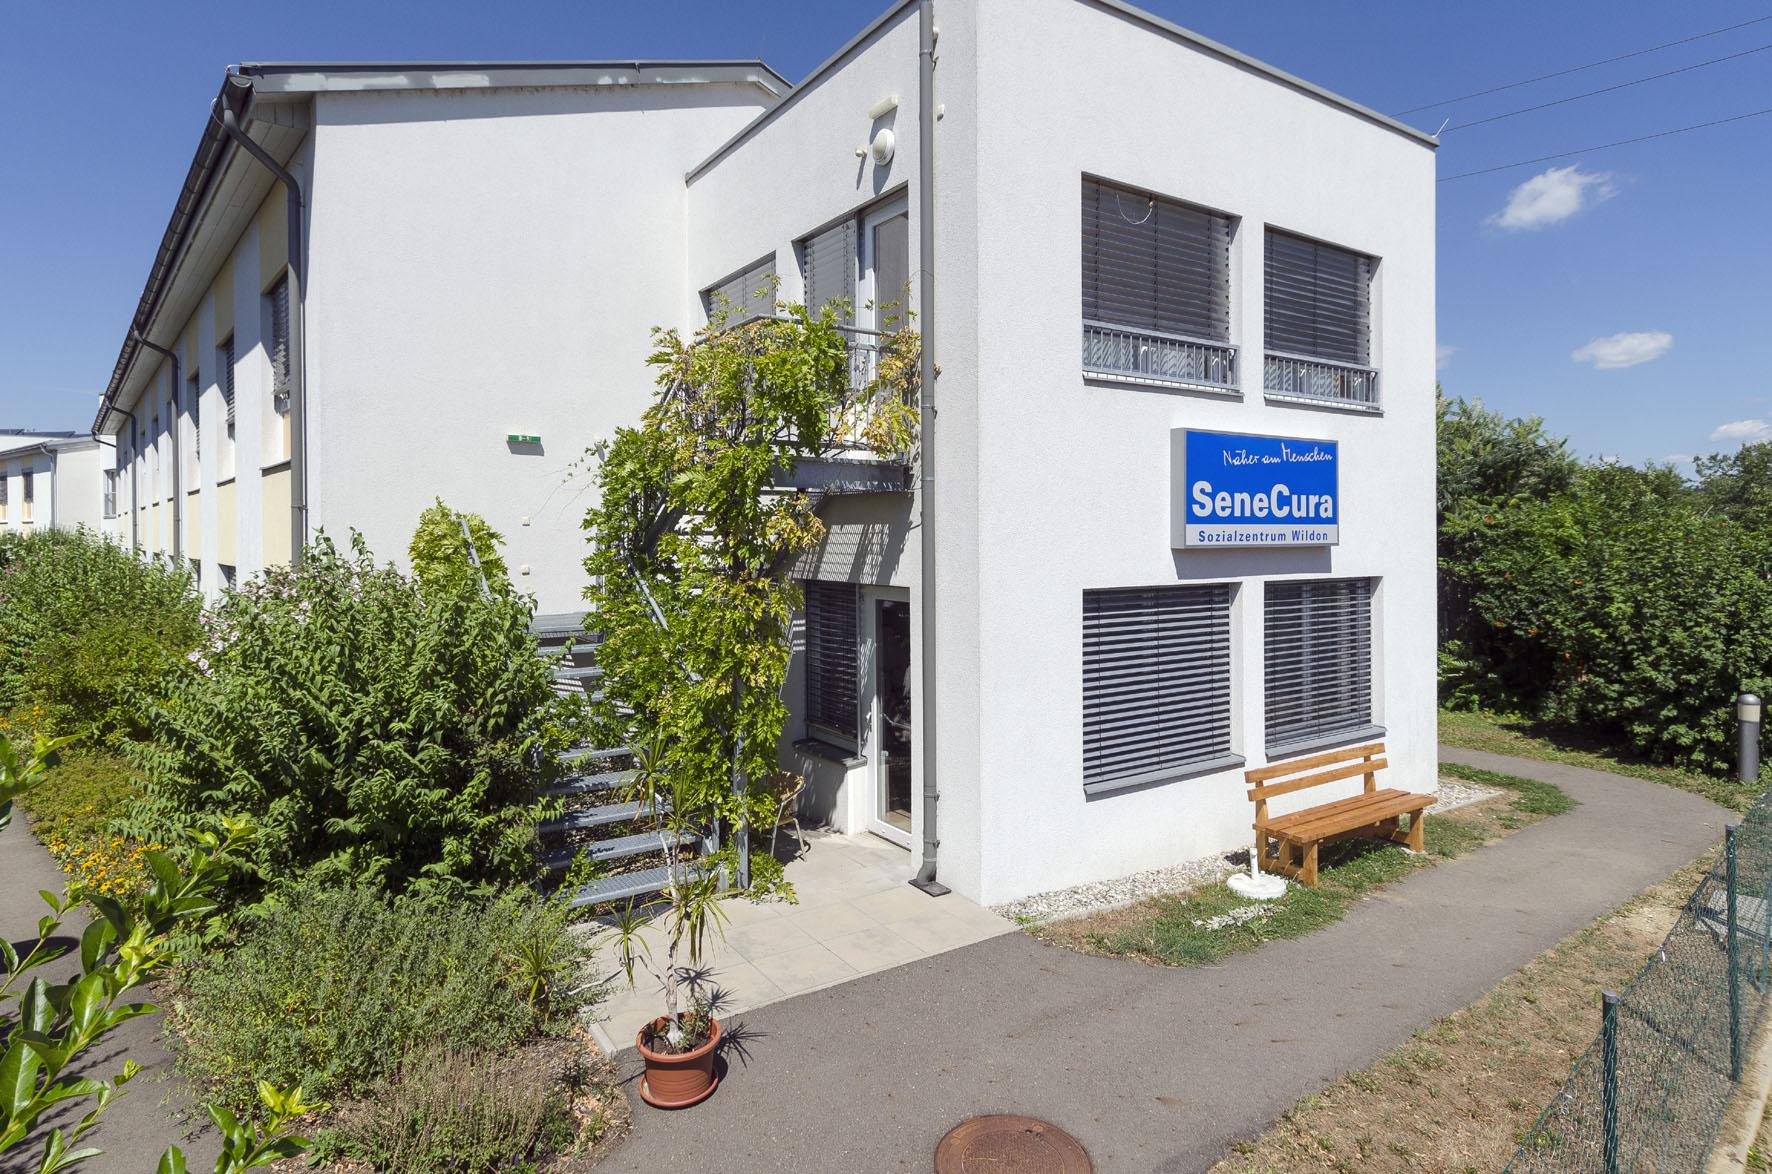 marktgemeinde wildon pflege - senecura sozialzentrum wildon